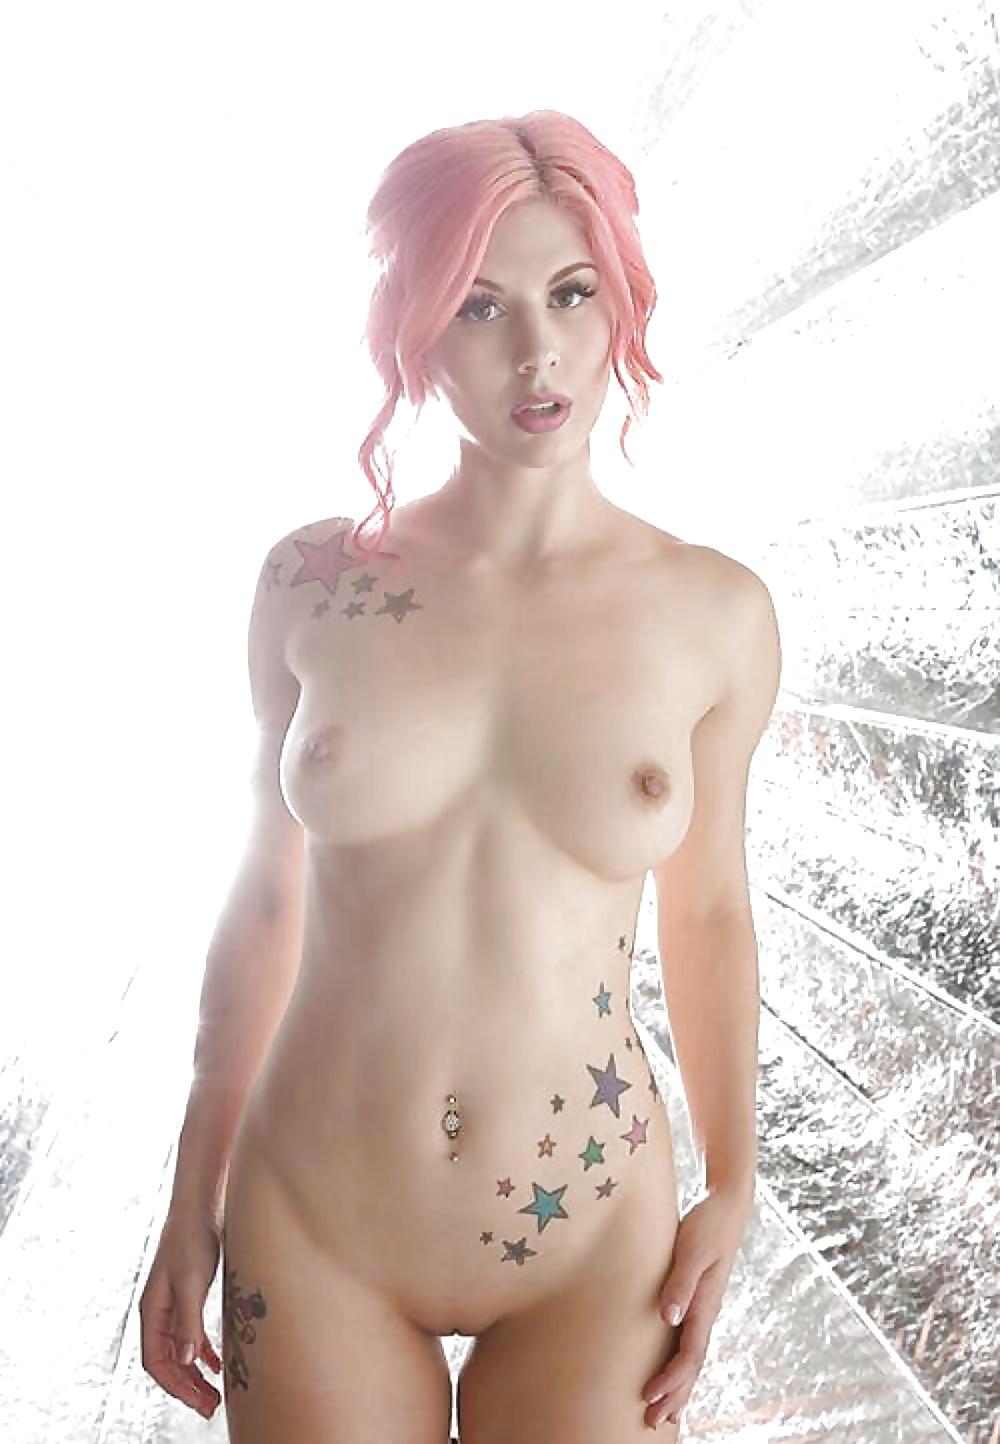 Pink girl nude